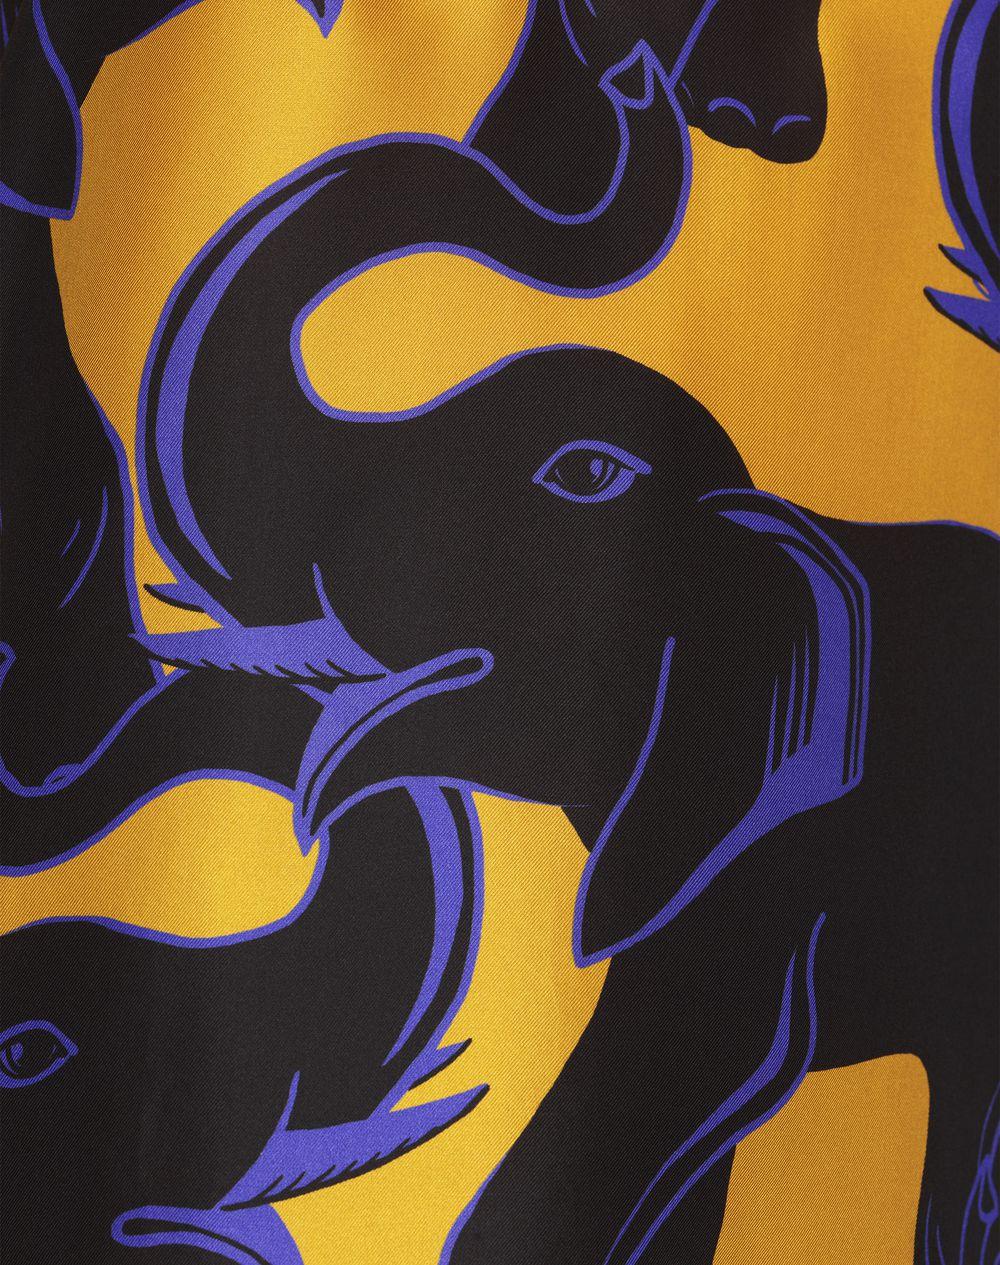 ELEPHANT-PRINT SILK TOP  - Lanvin